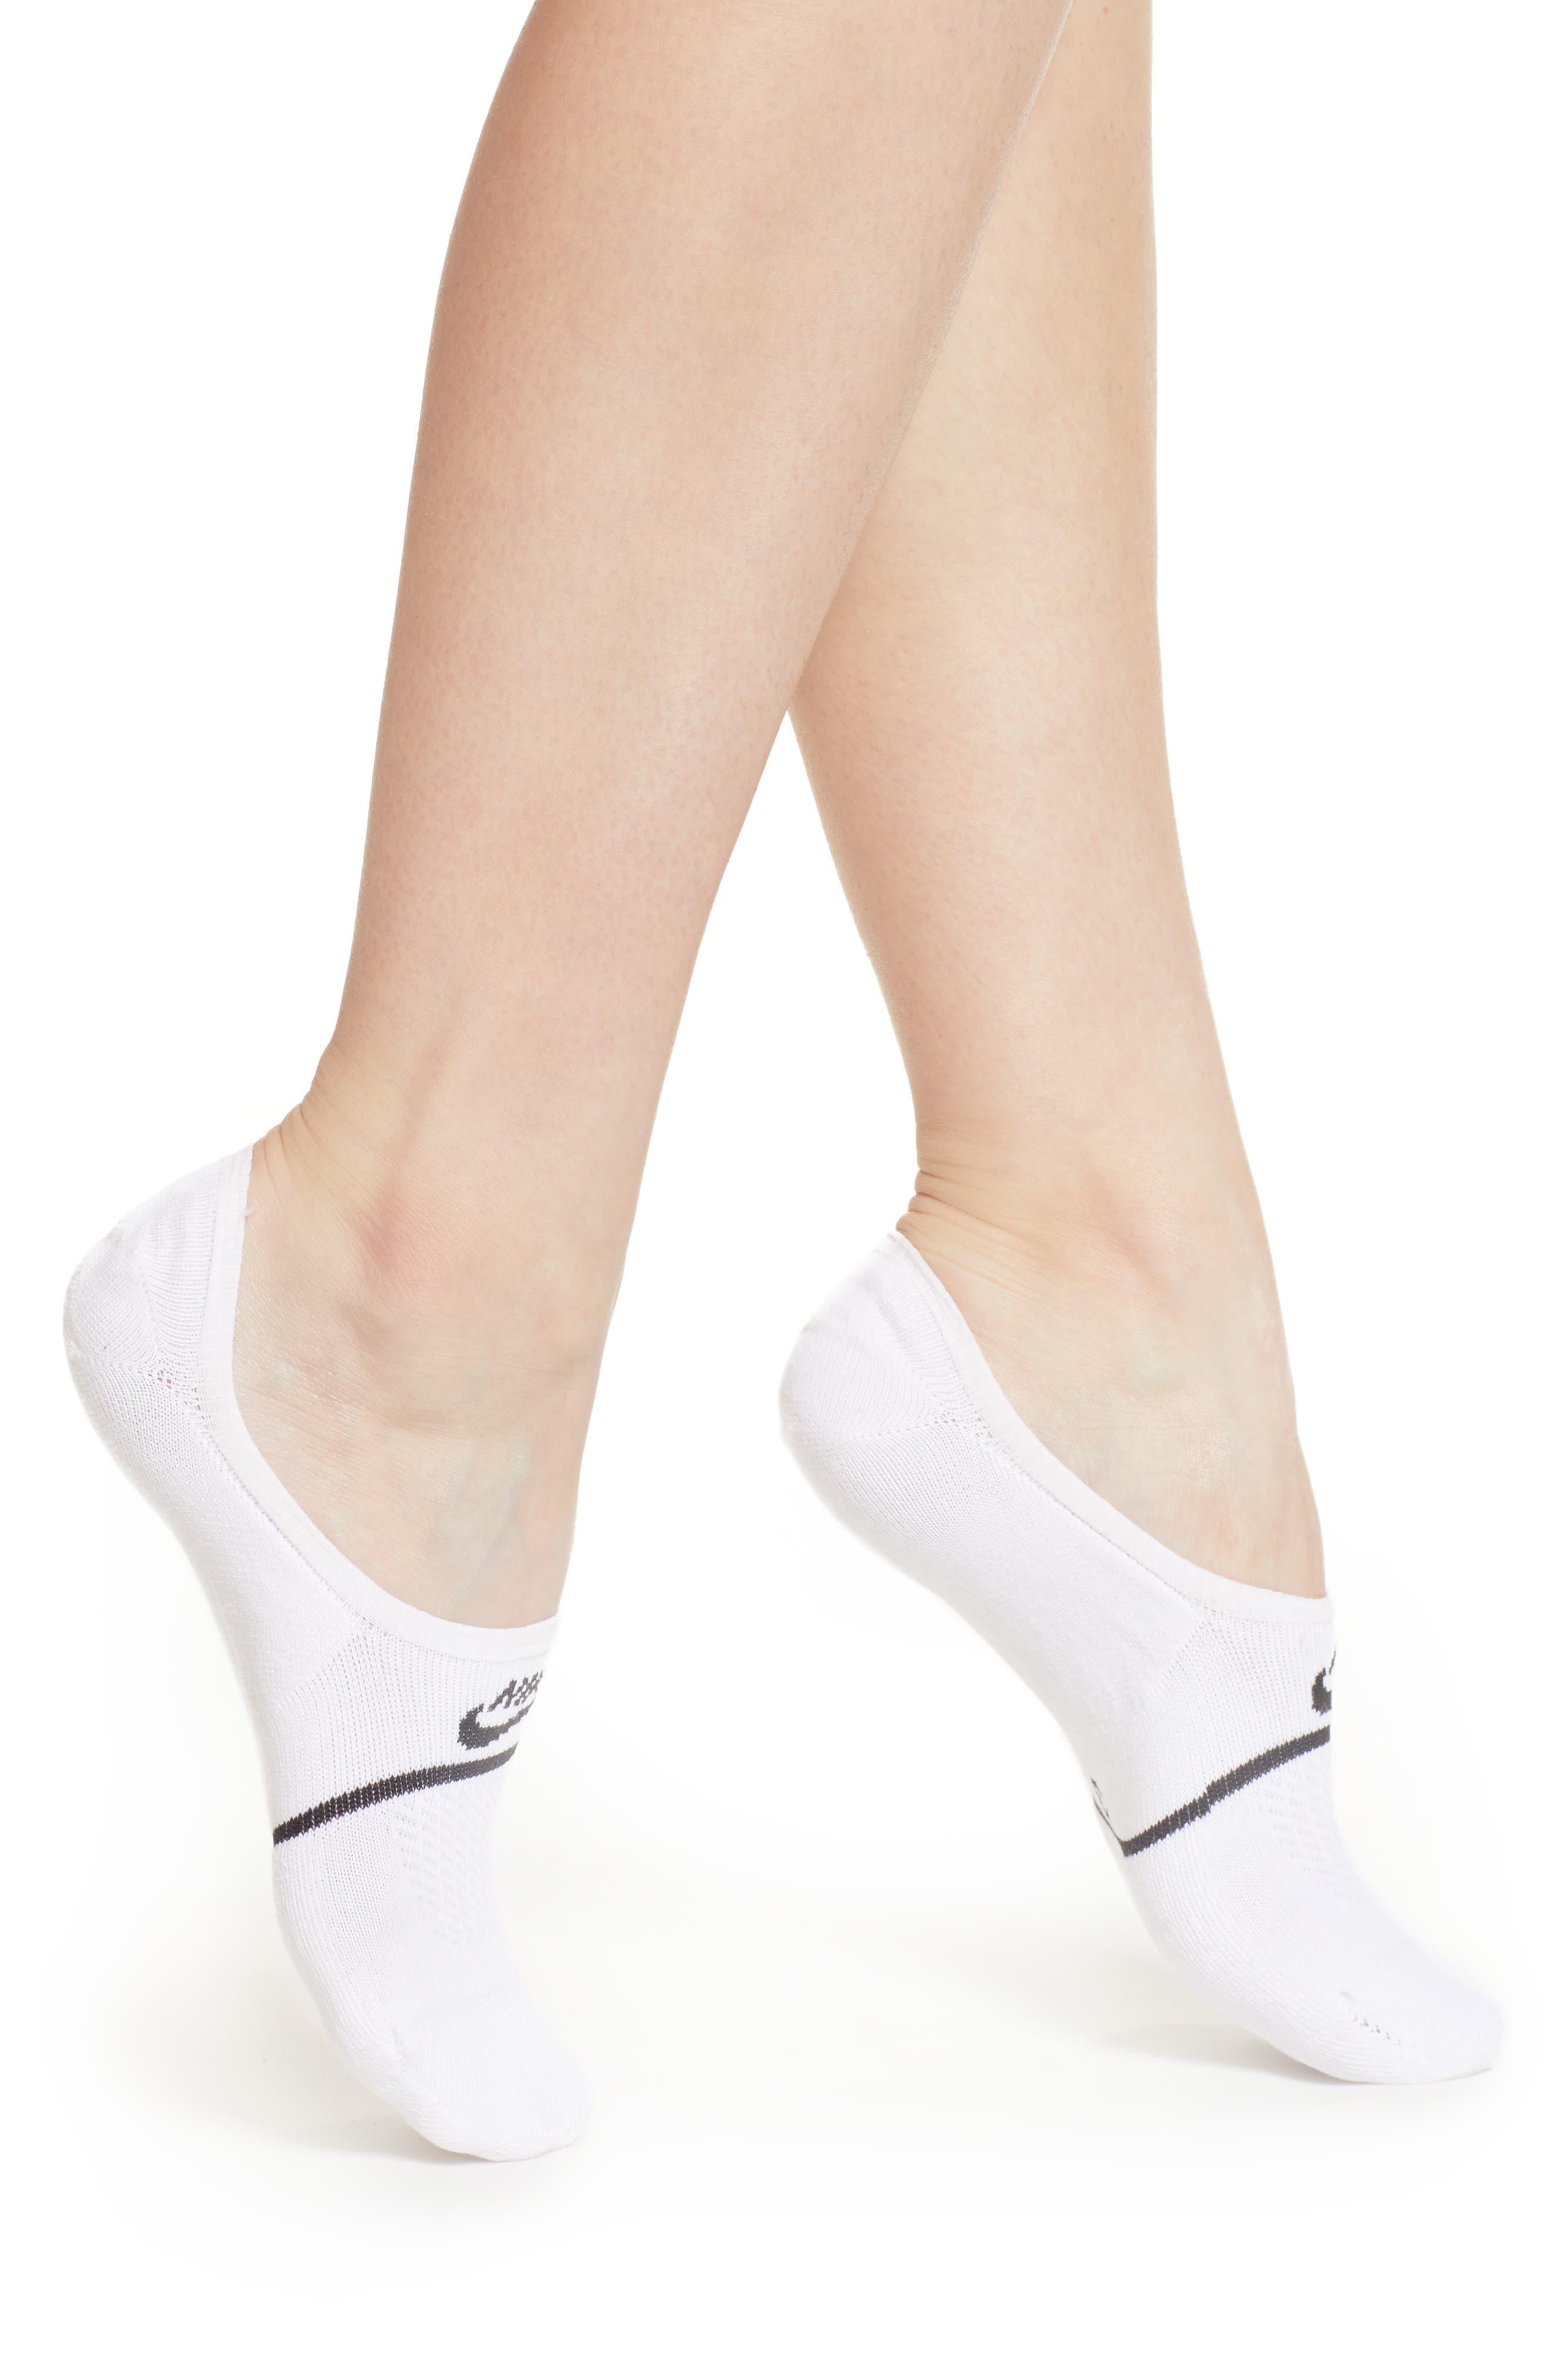 2-Pack Snkr Sox Essential No Show Socks in White/ Black/ White